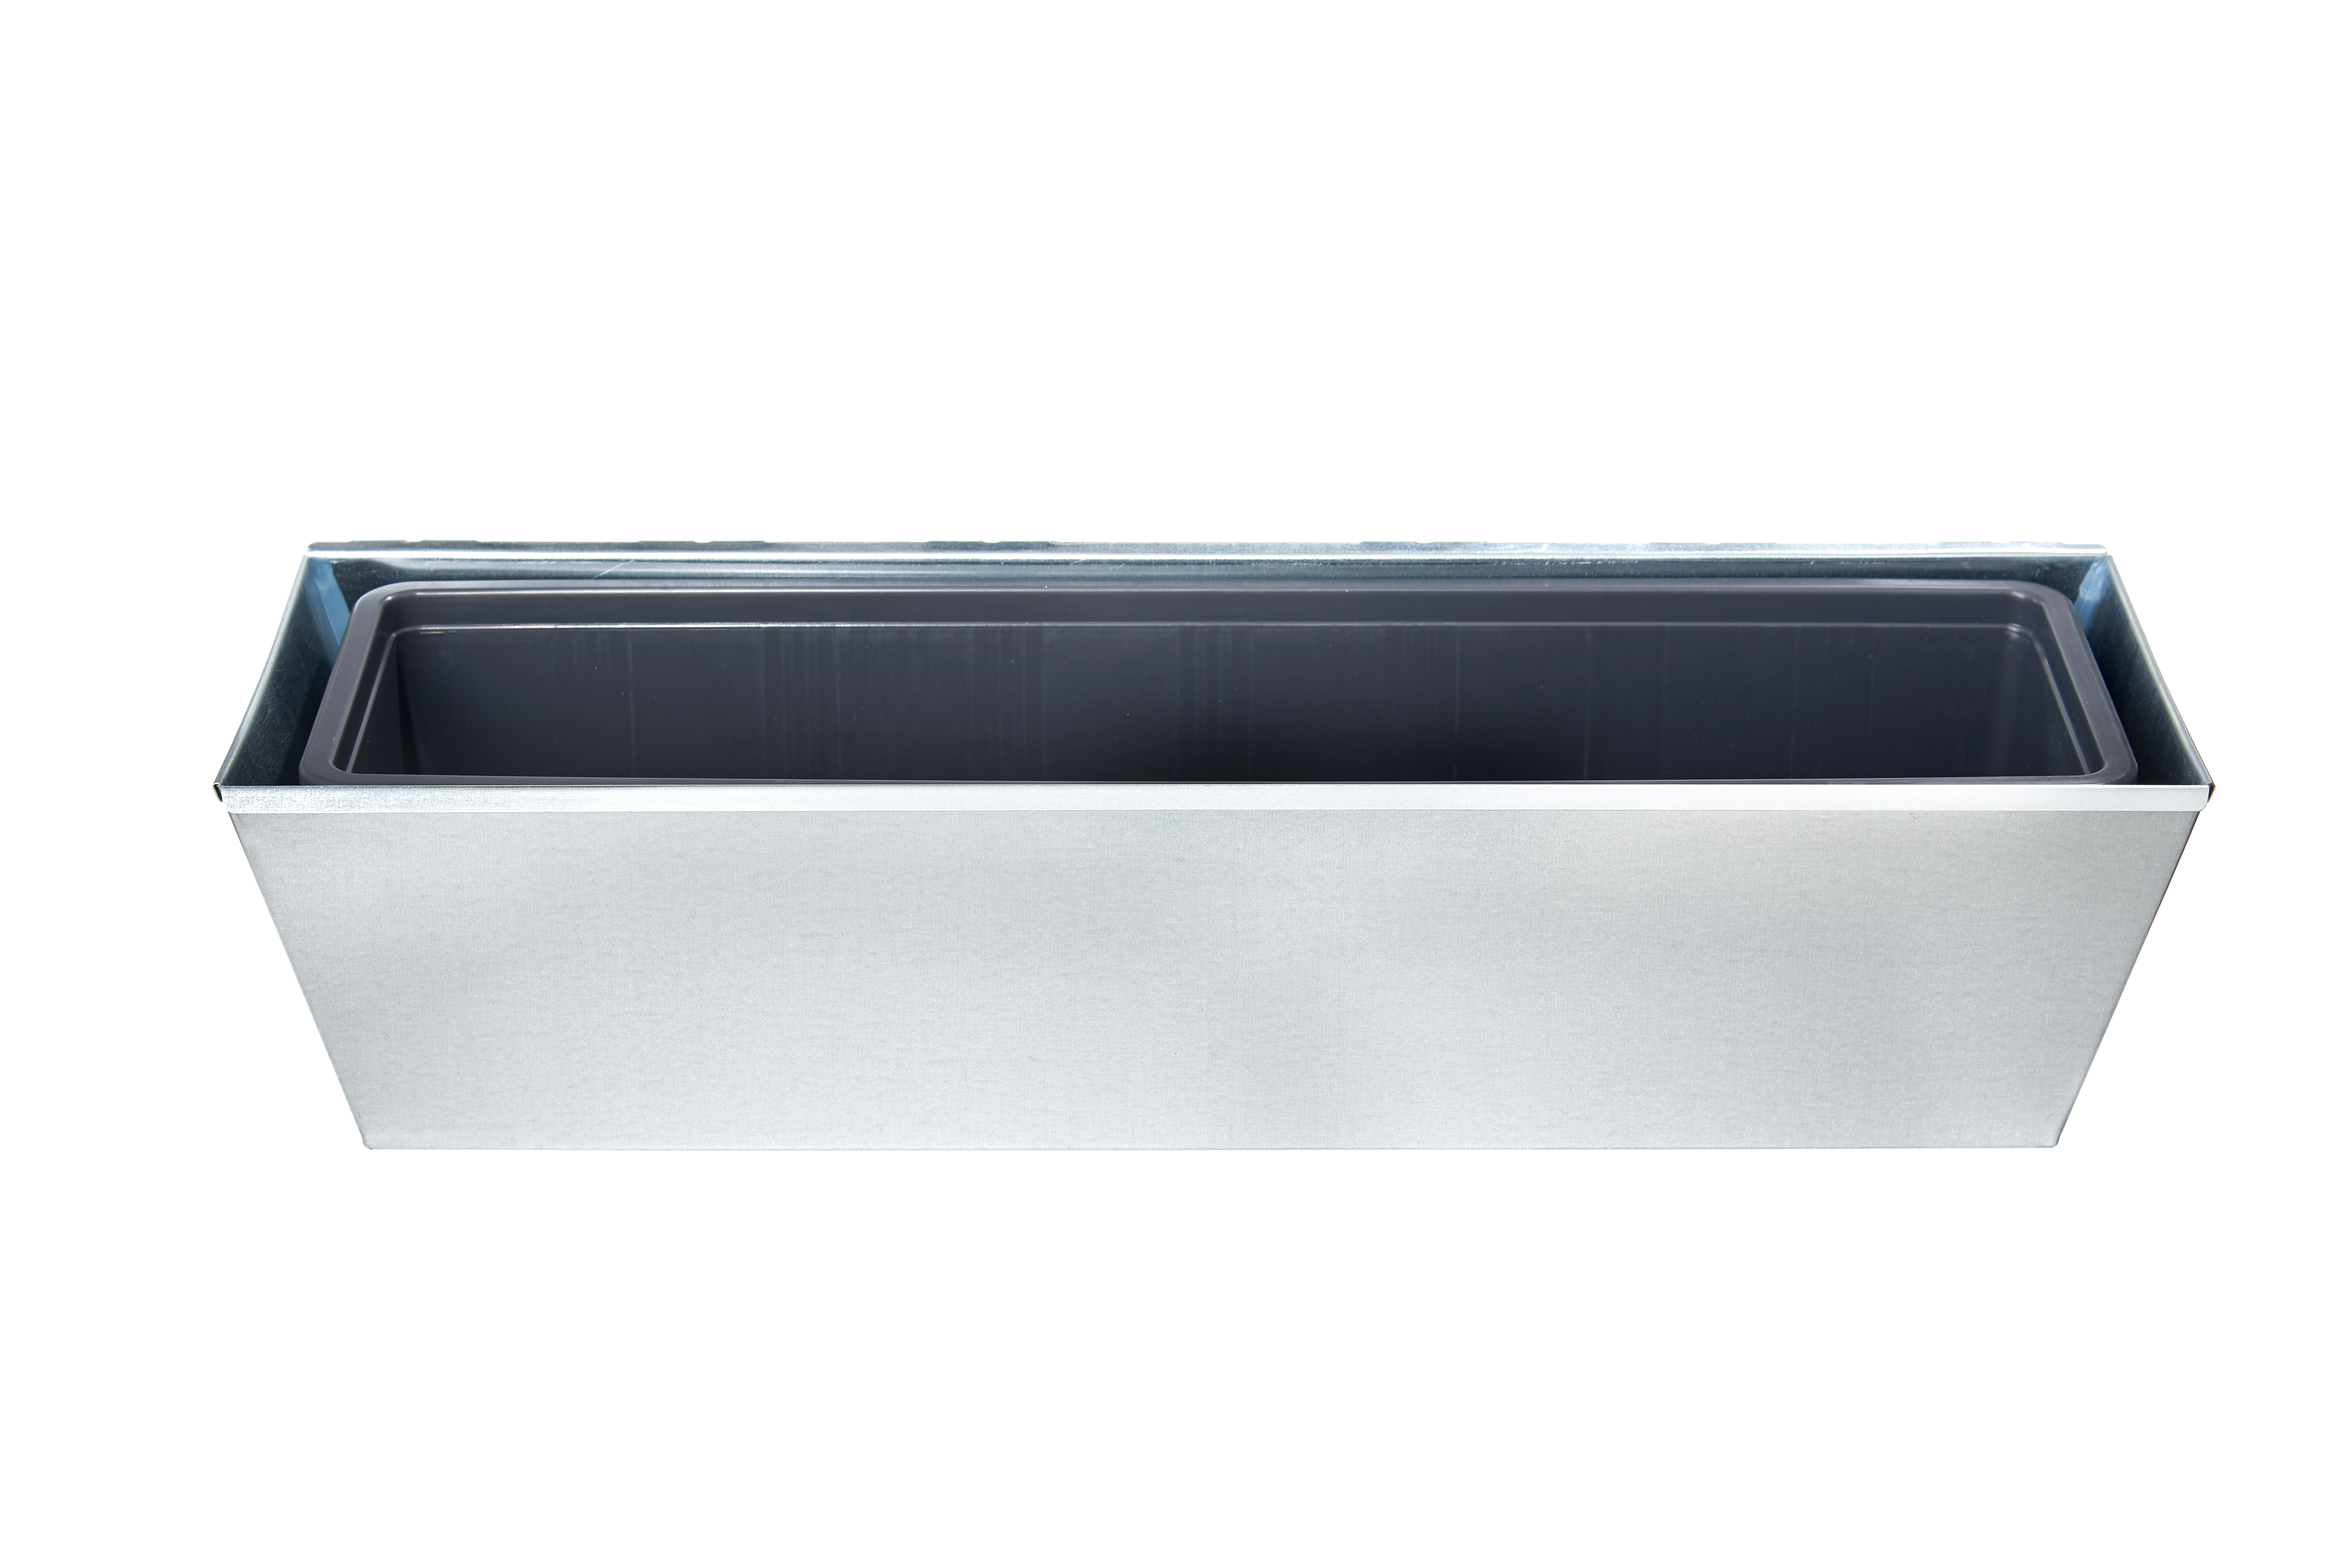 gabioka flowerbox 60cm standard verzinkt